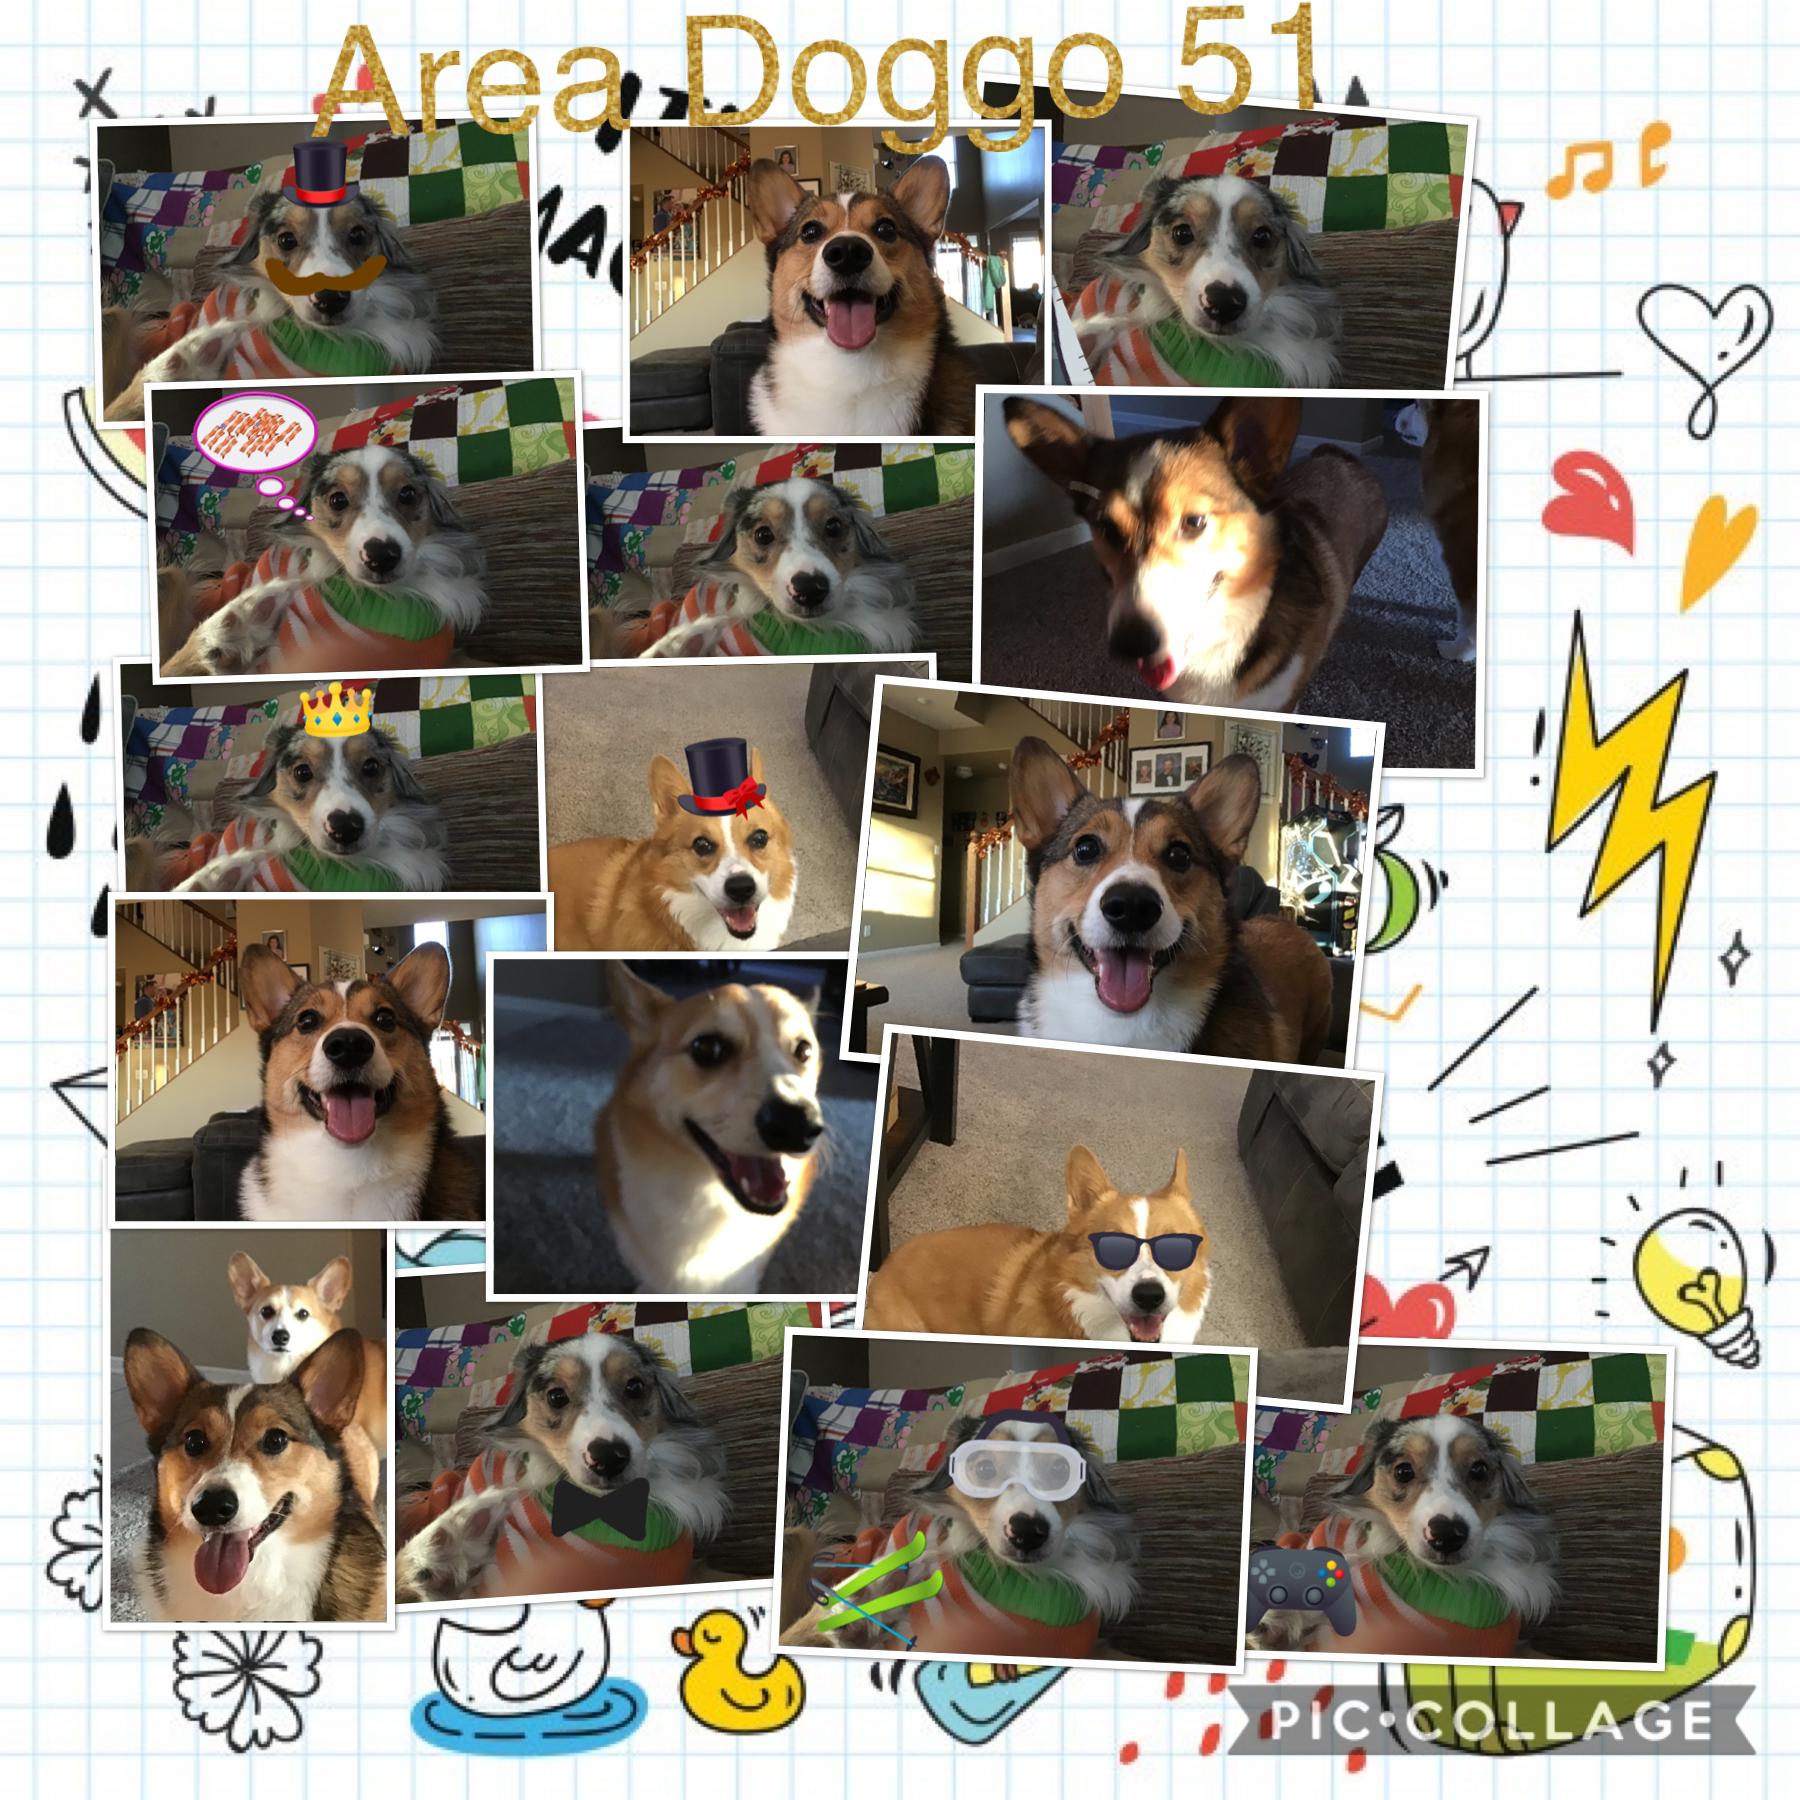 Area doggo 51 😂😆😉😁😊🤣